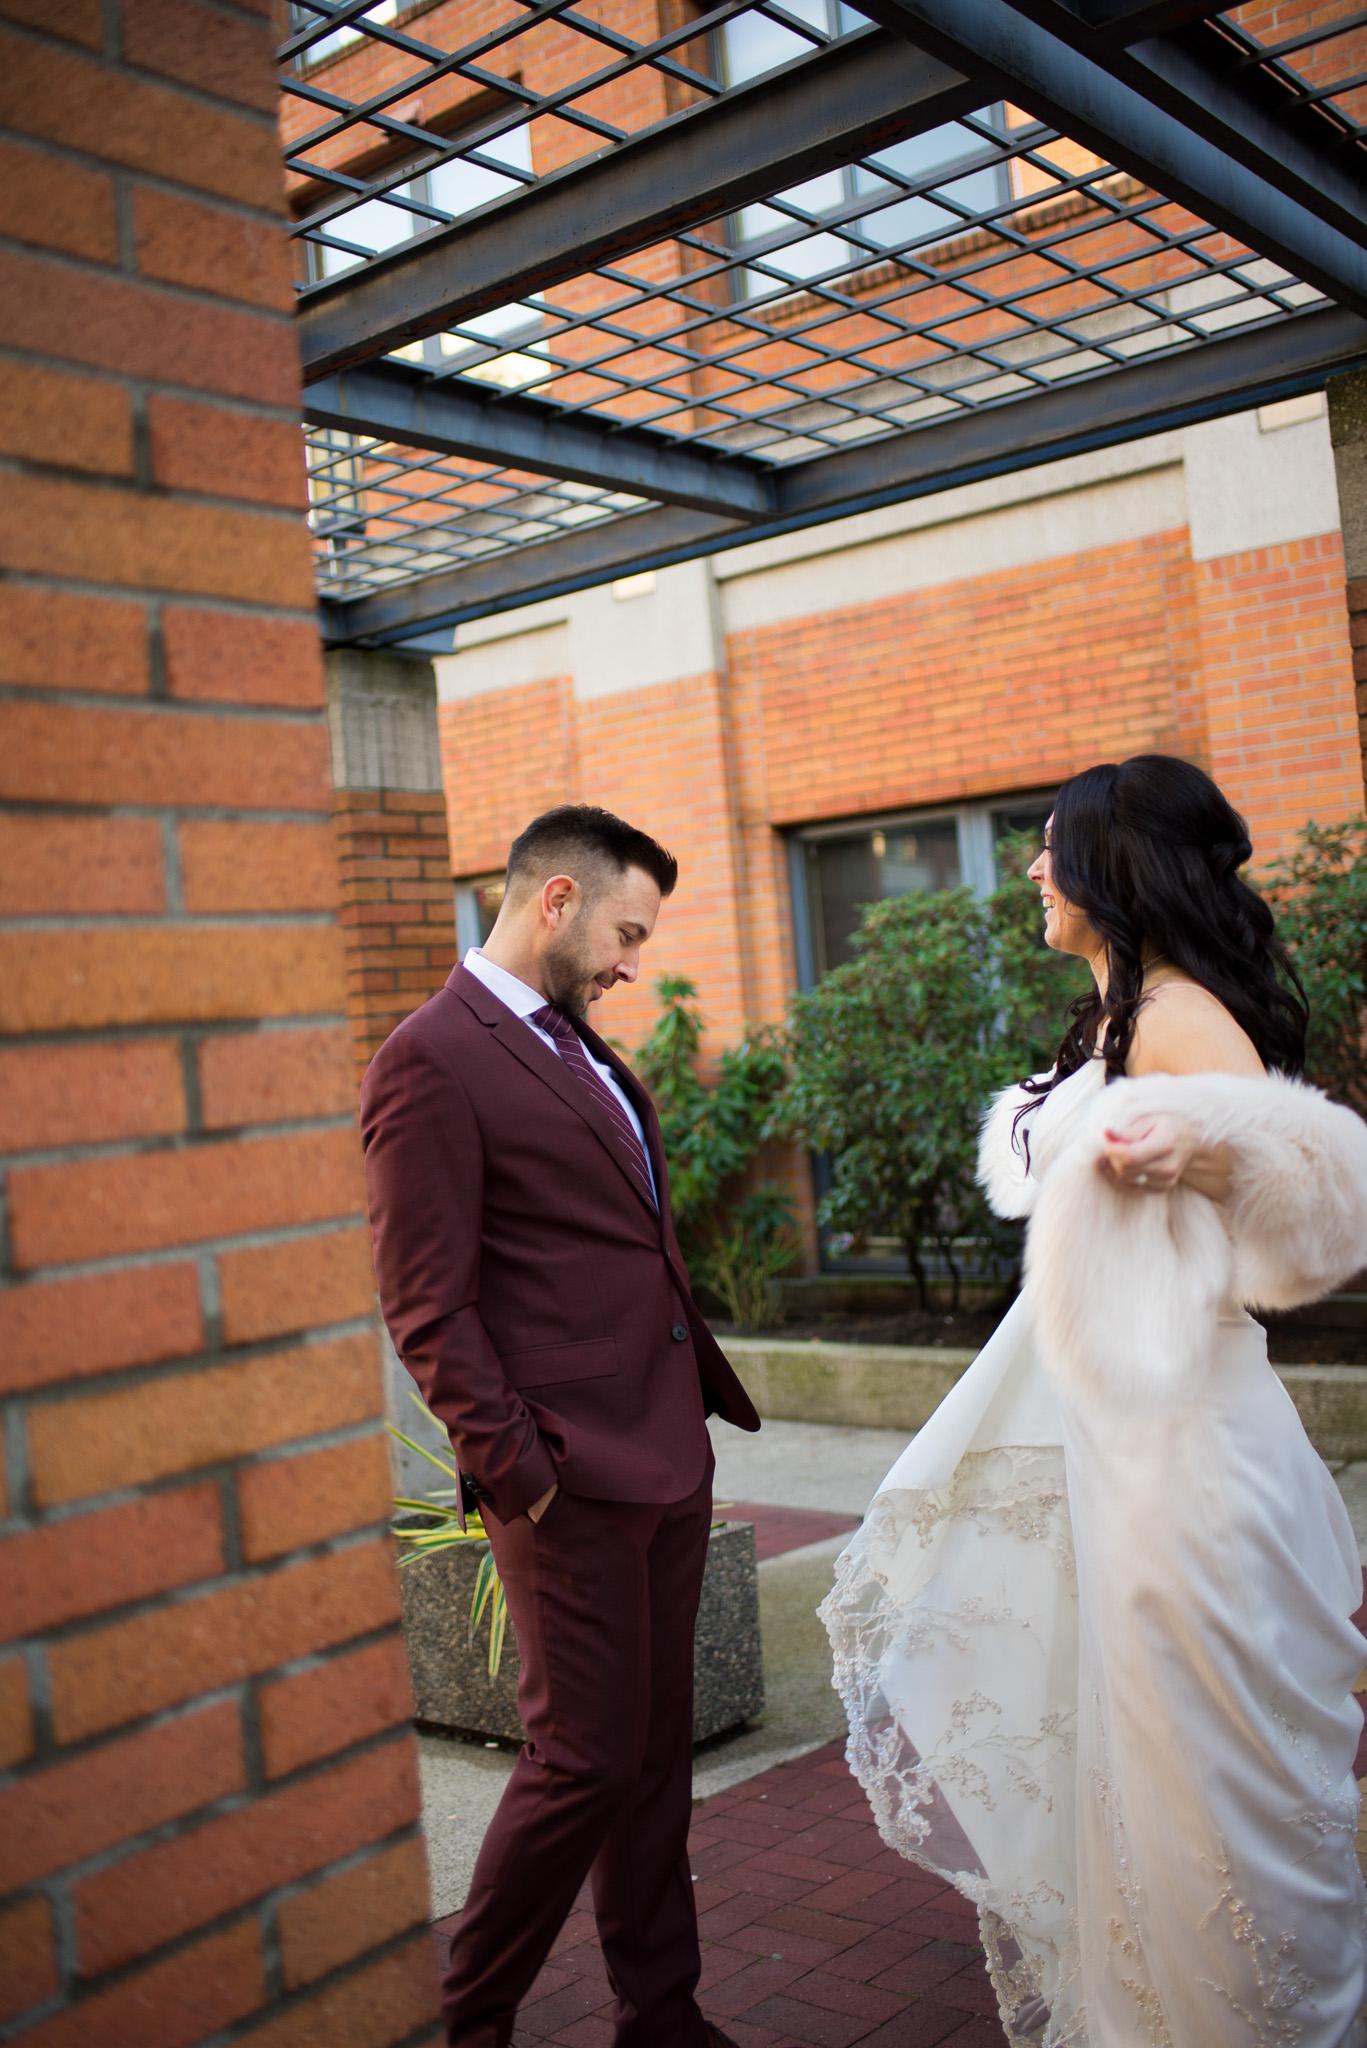 Brix and Mortar Wedding Photos-27.jpg